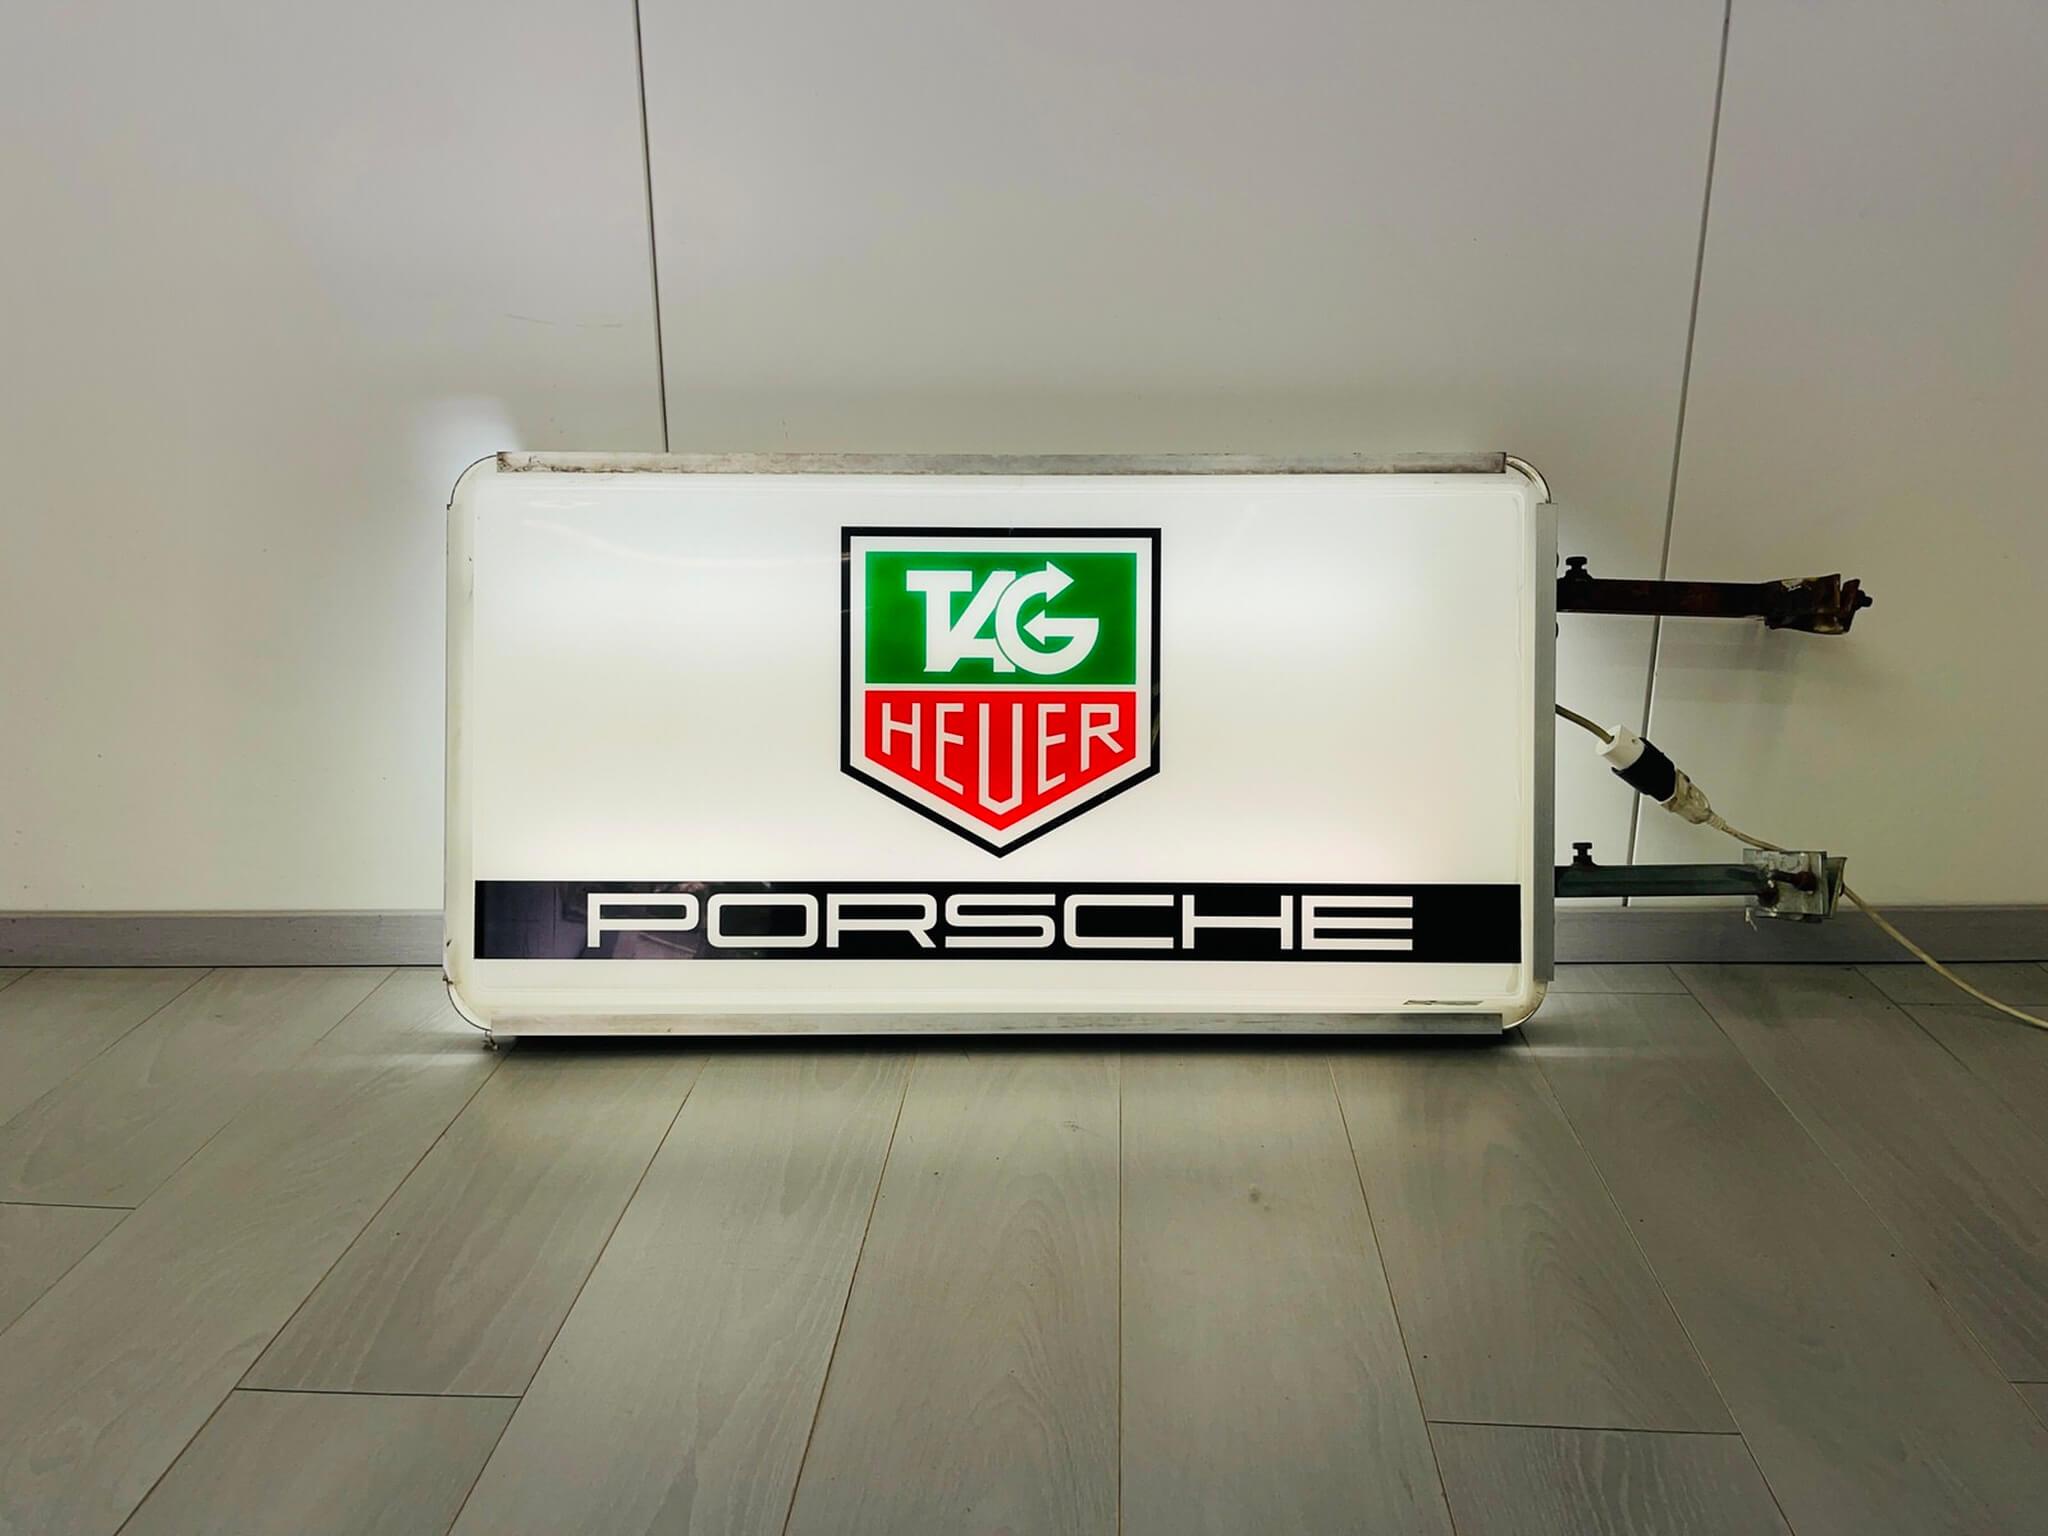 "No Reserve Porsche TAG Heuer Illuminated Sign (42"" x 23"")"